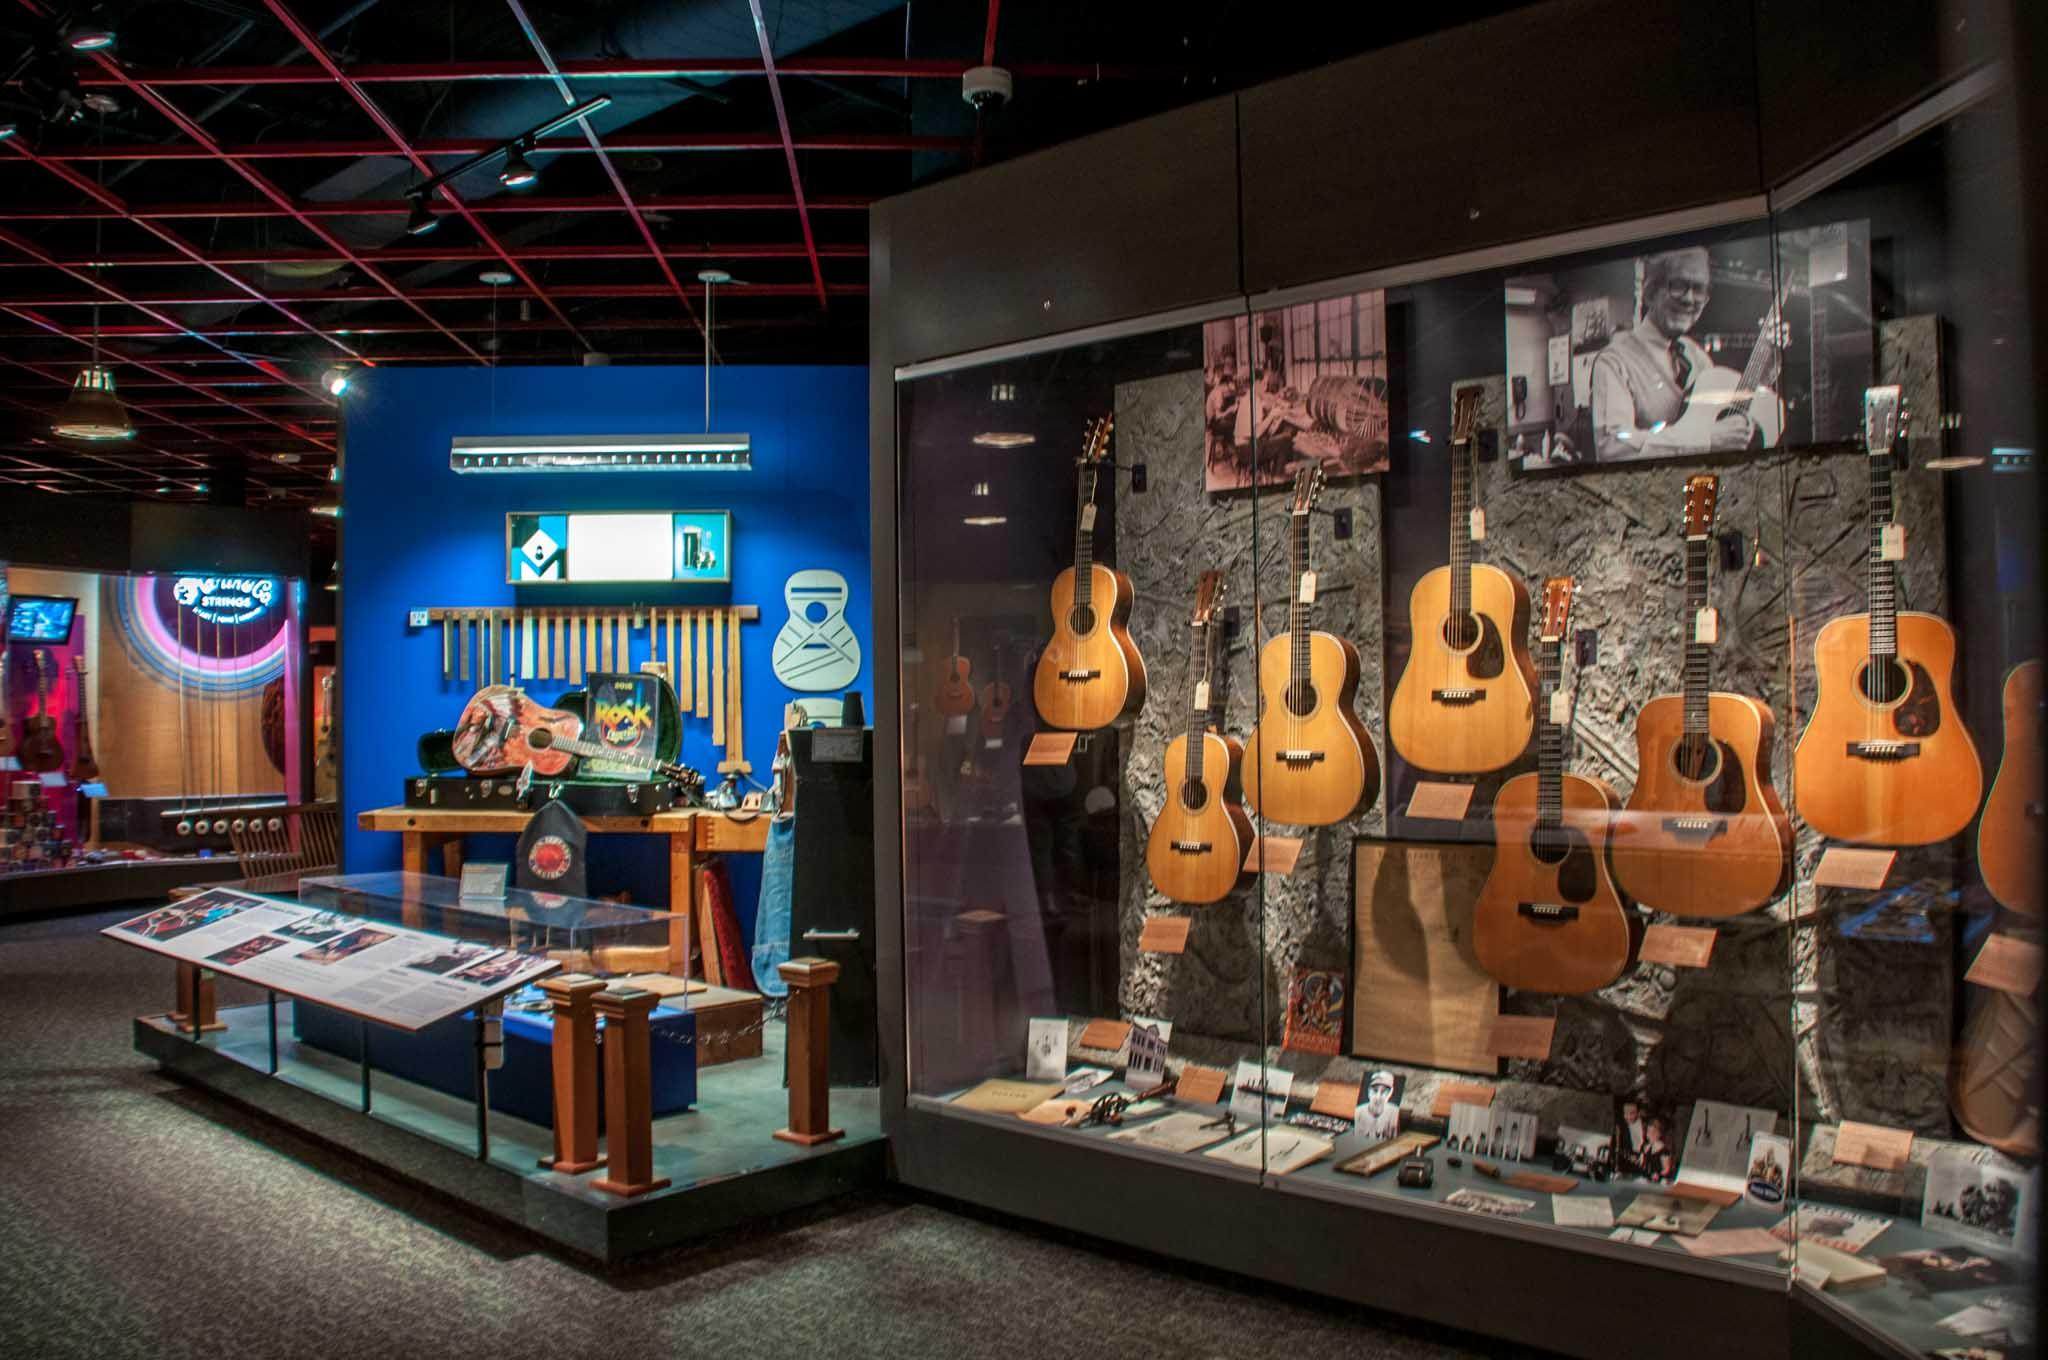 Glass case of guitars in the memorabilia room at the Martin Guitar Factory